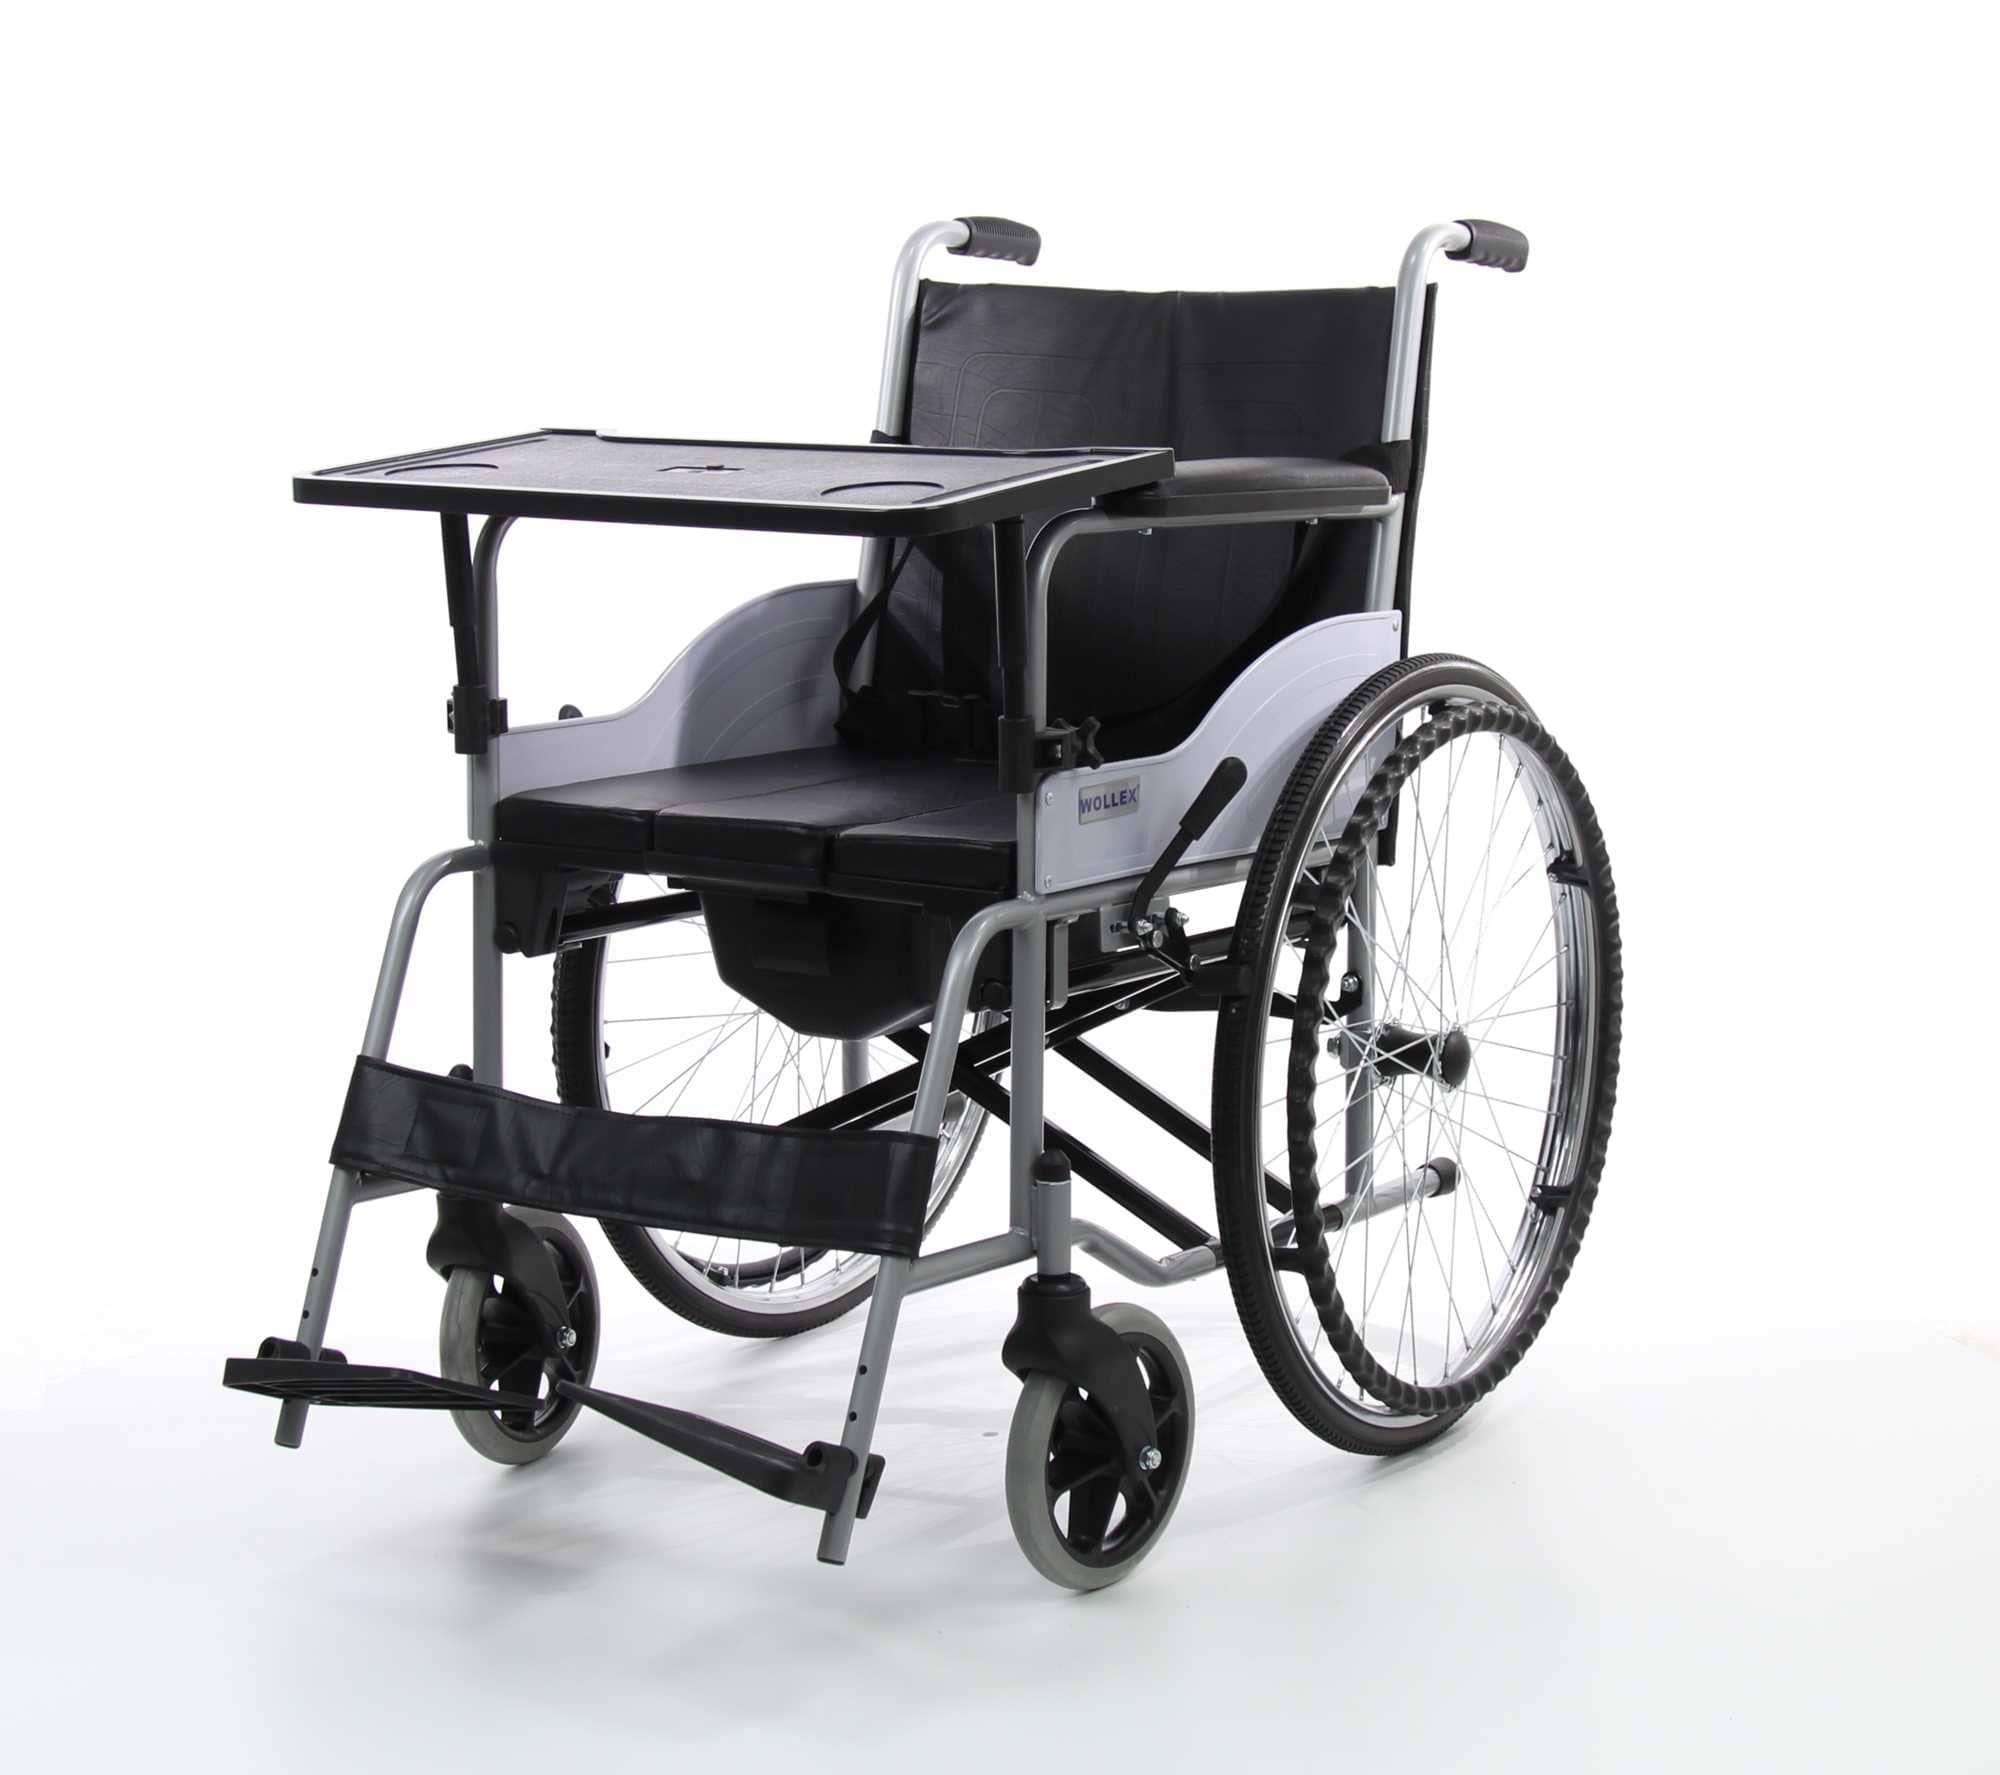 WOLLEX W216 Tekerlekli Sandalye/Klozetli